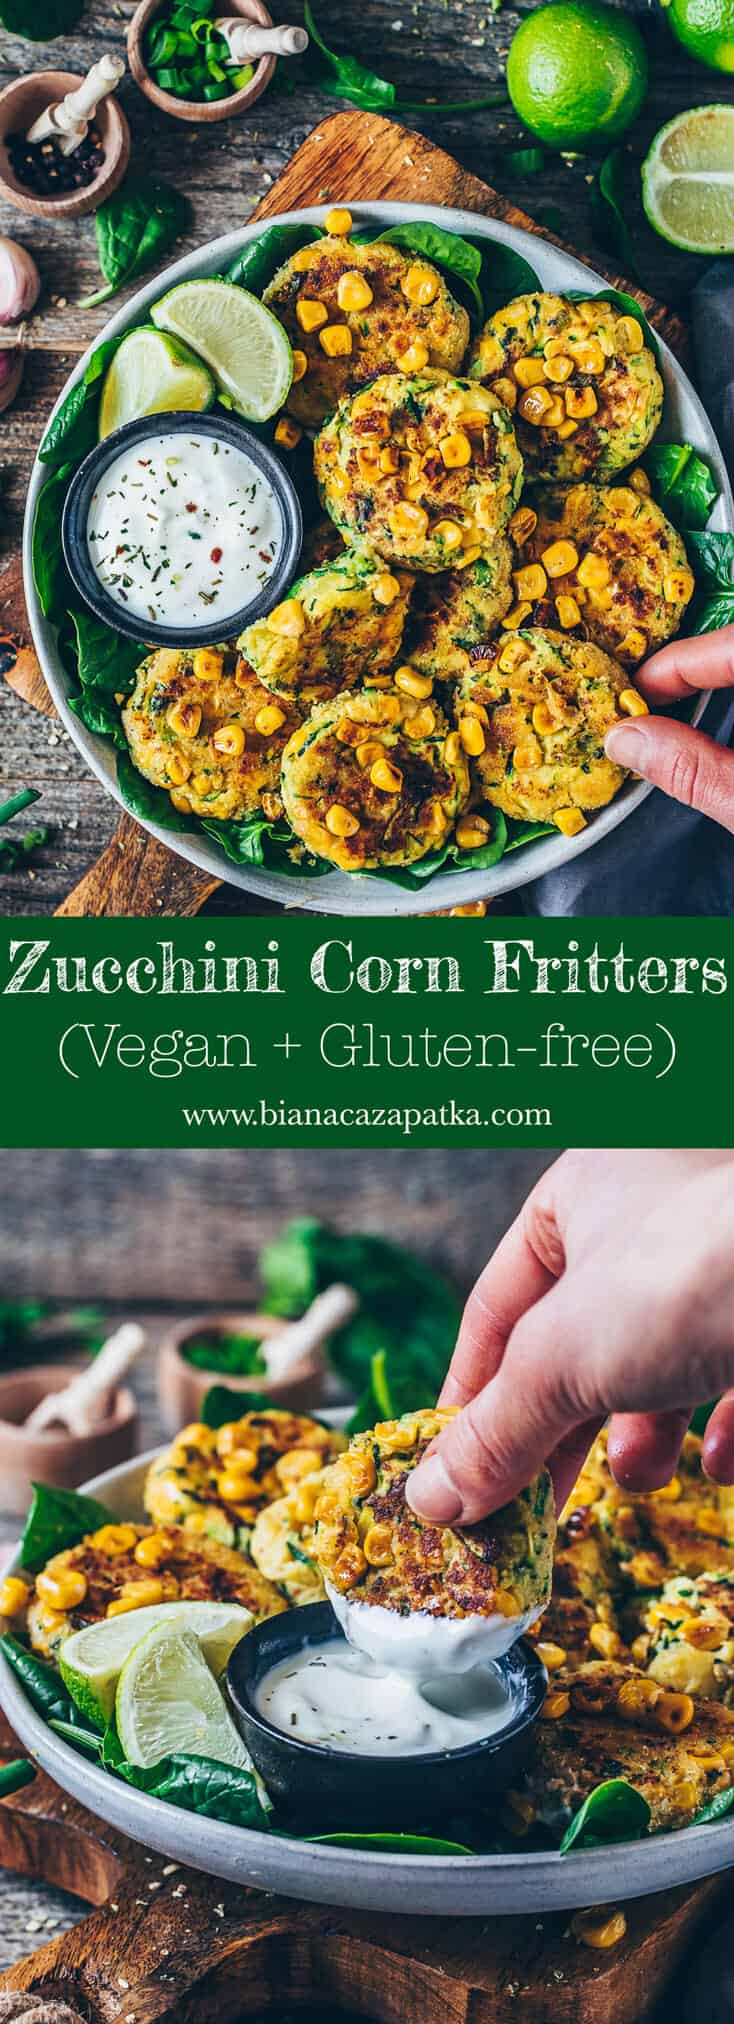 Zucchini Corn Fritters, crispy vegan veggie fritters, healthy, delicious, gluten-free, quick and easy recipe.